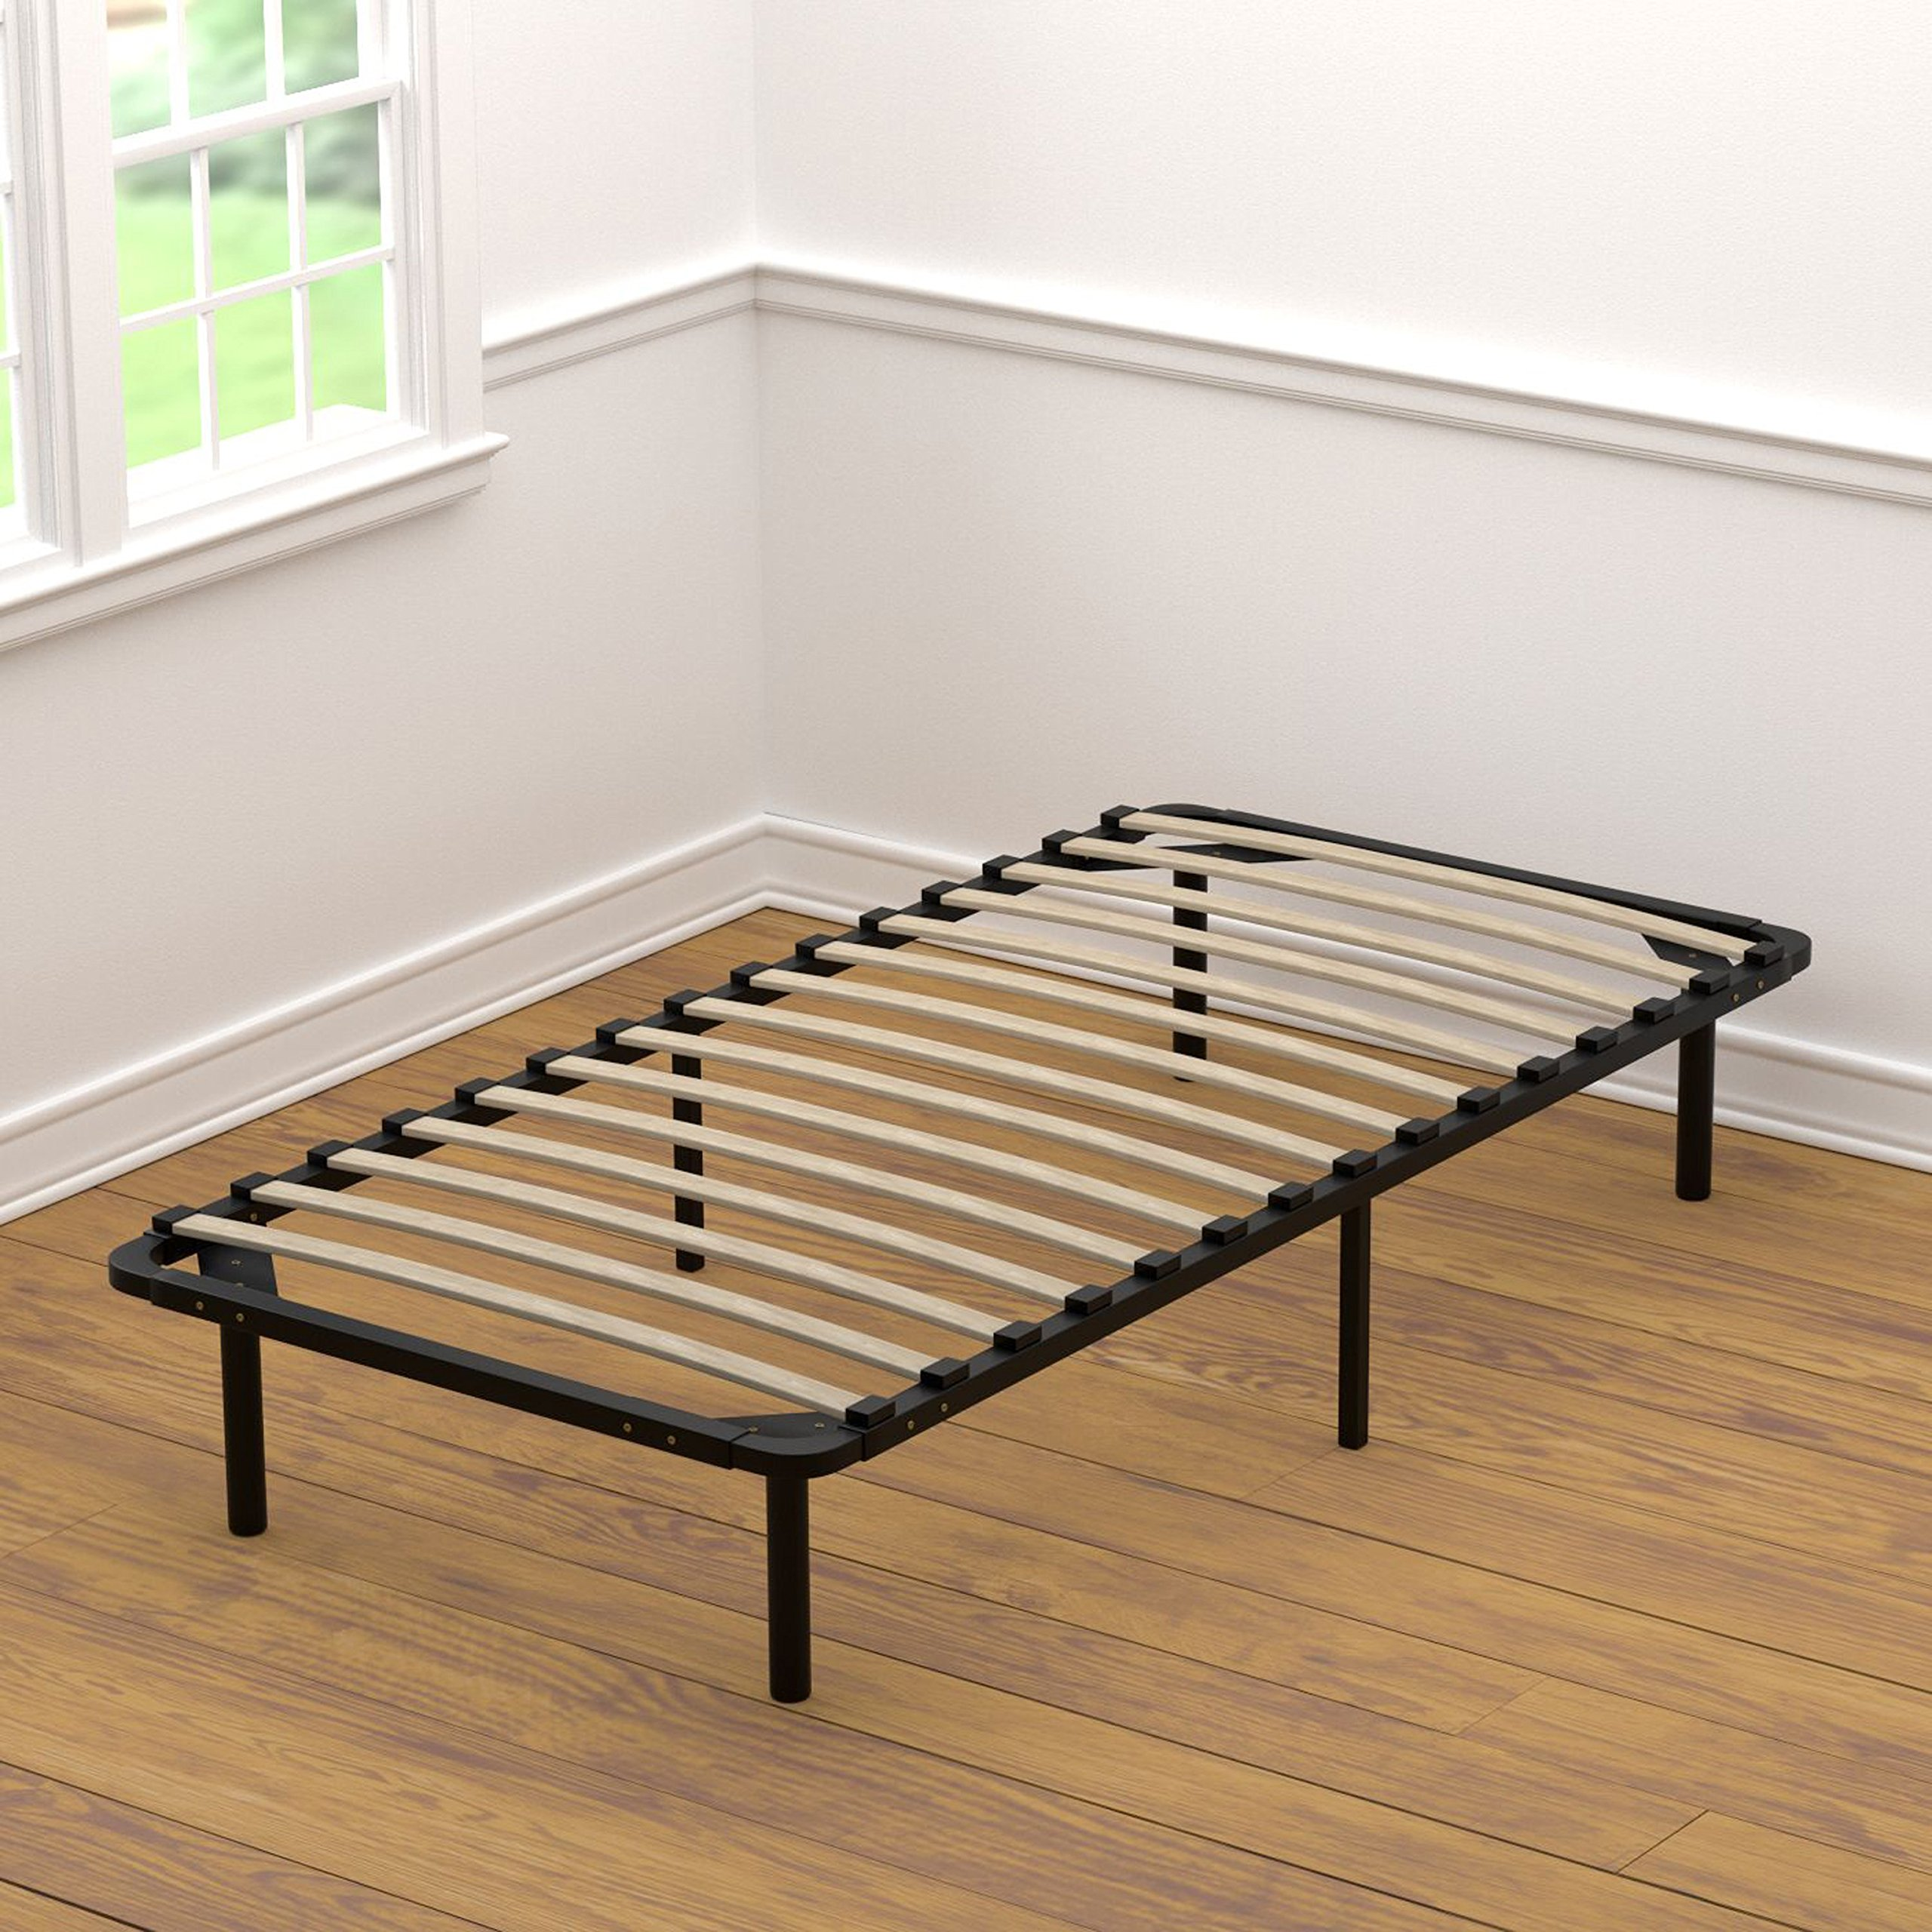 Handy Living Platform Bed Frame - Wooden Slat Mattress Foundation/Box Spring Replacement, Twin-XL by Handy Living